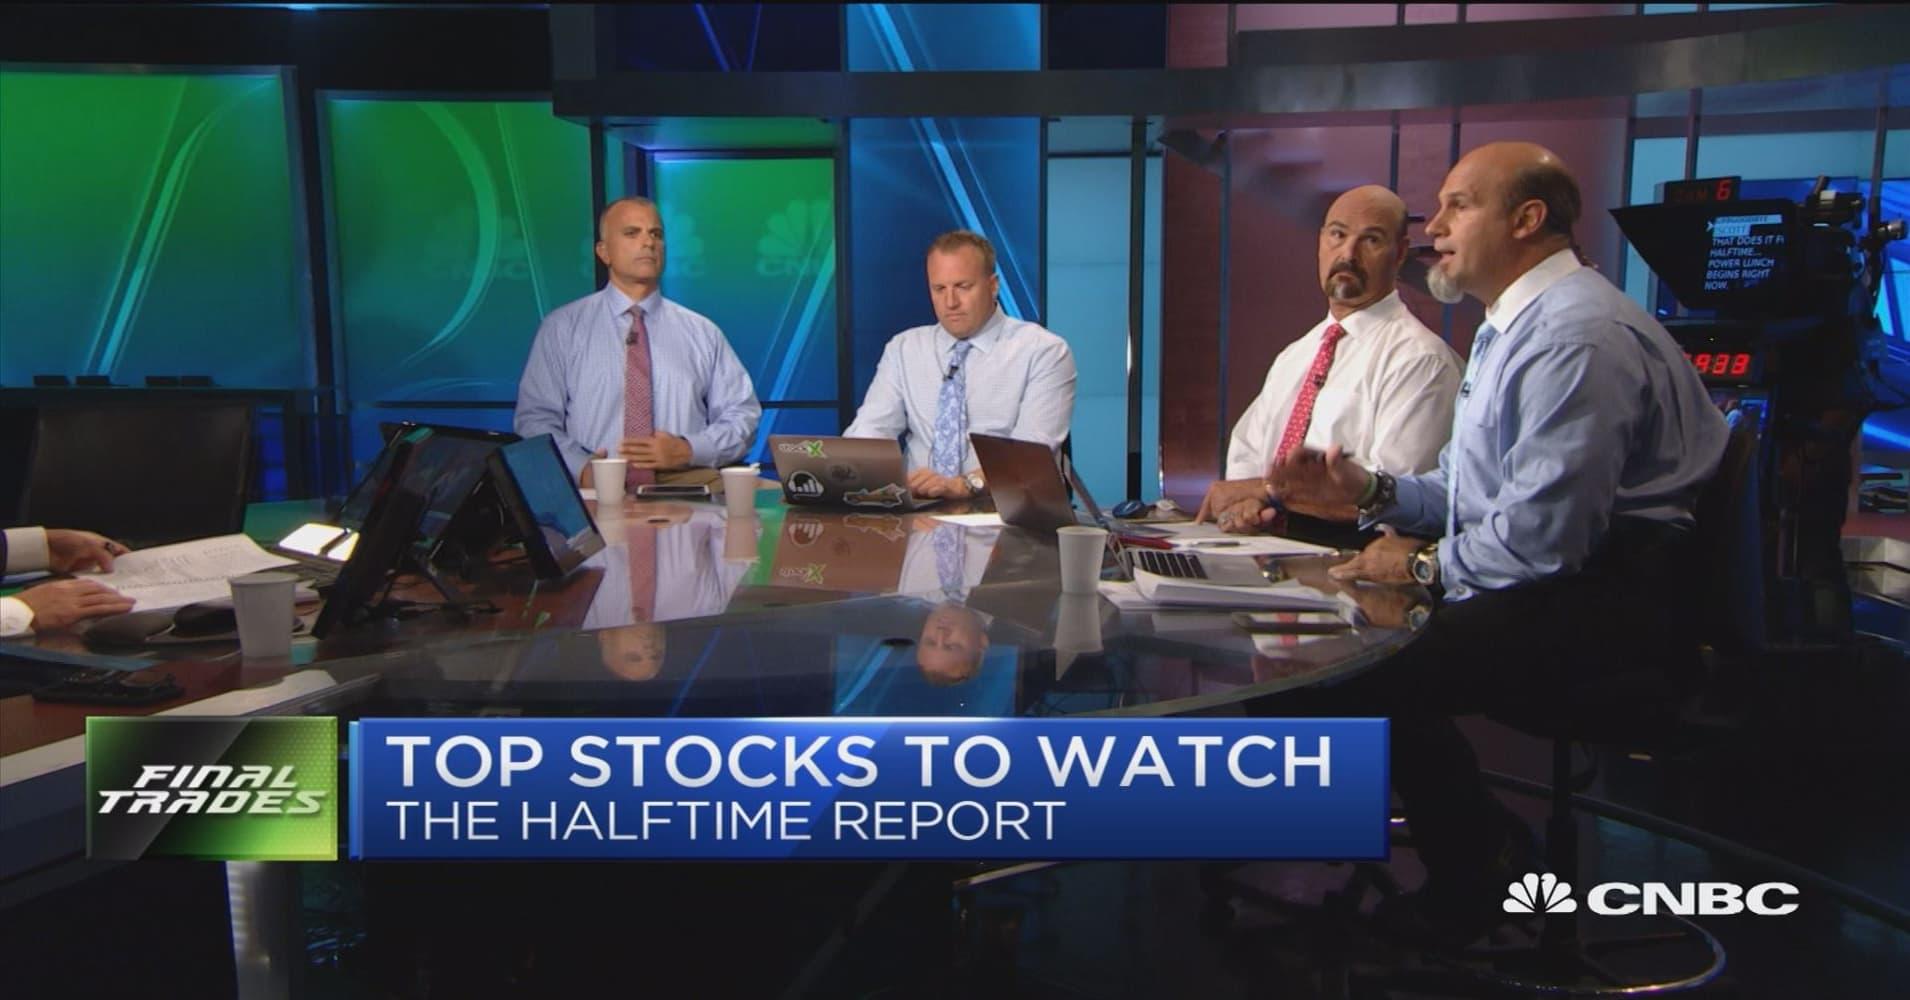 Final trades: Northrop Grumman, JPMorgan, Nutanix & AMD